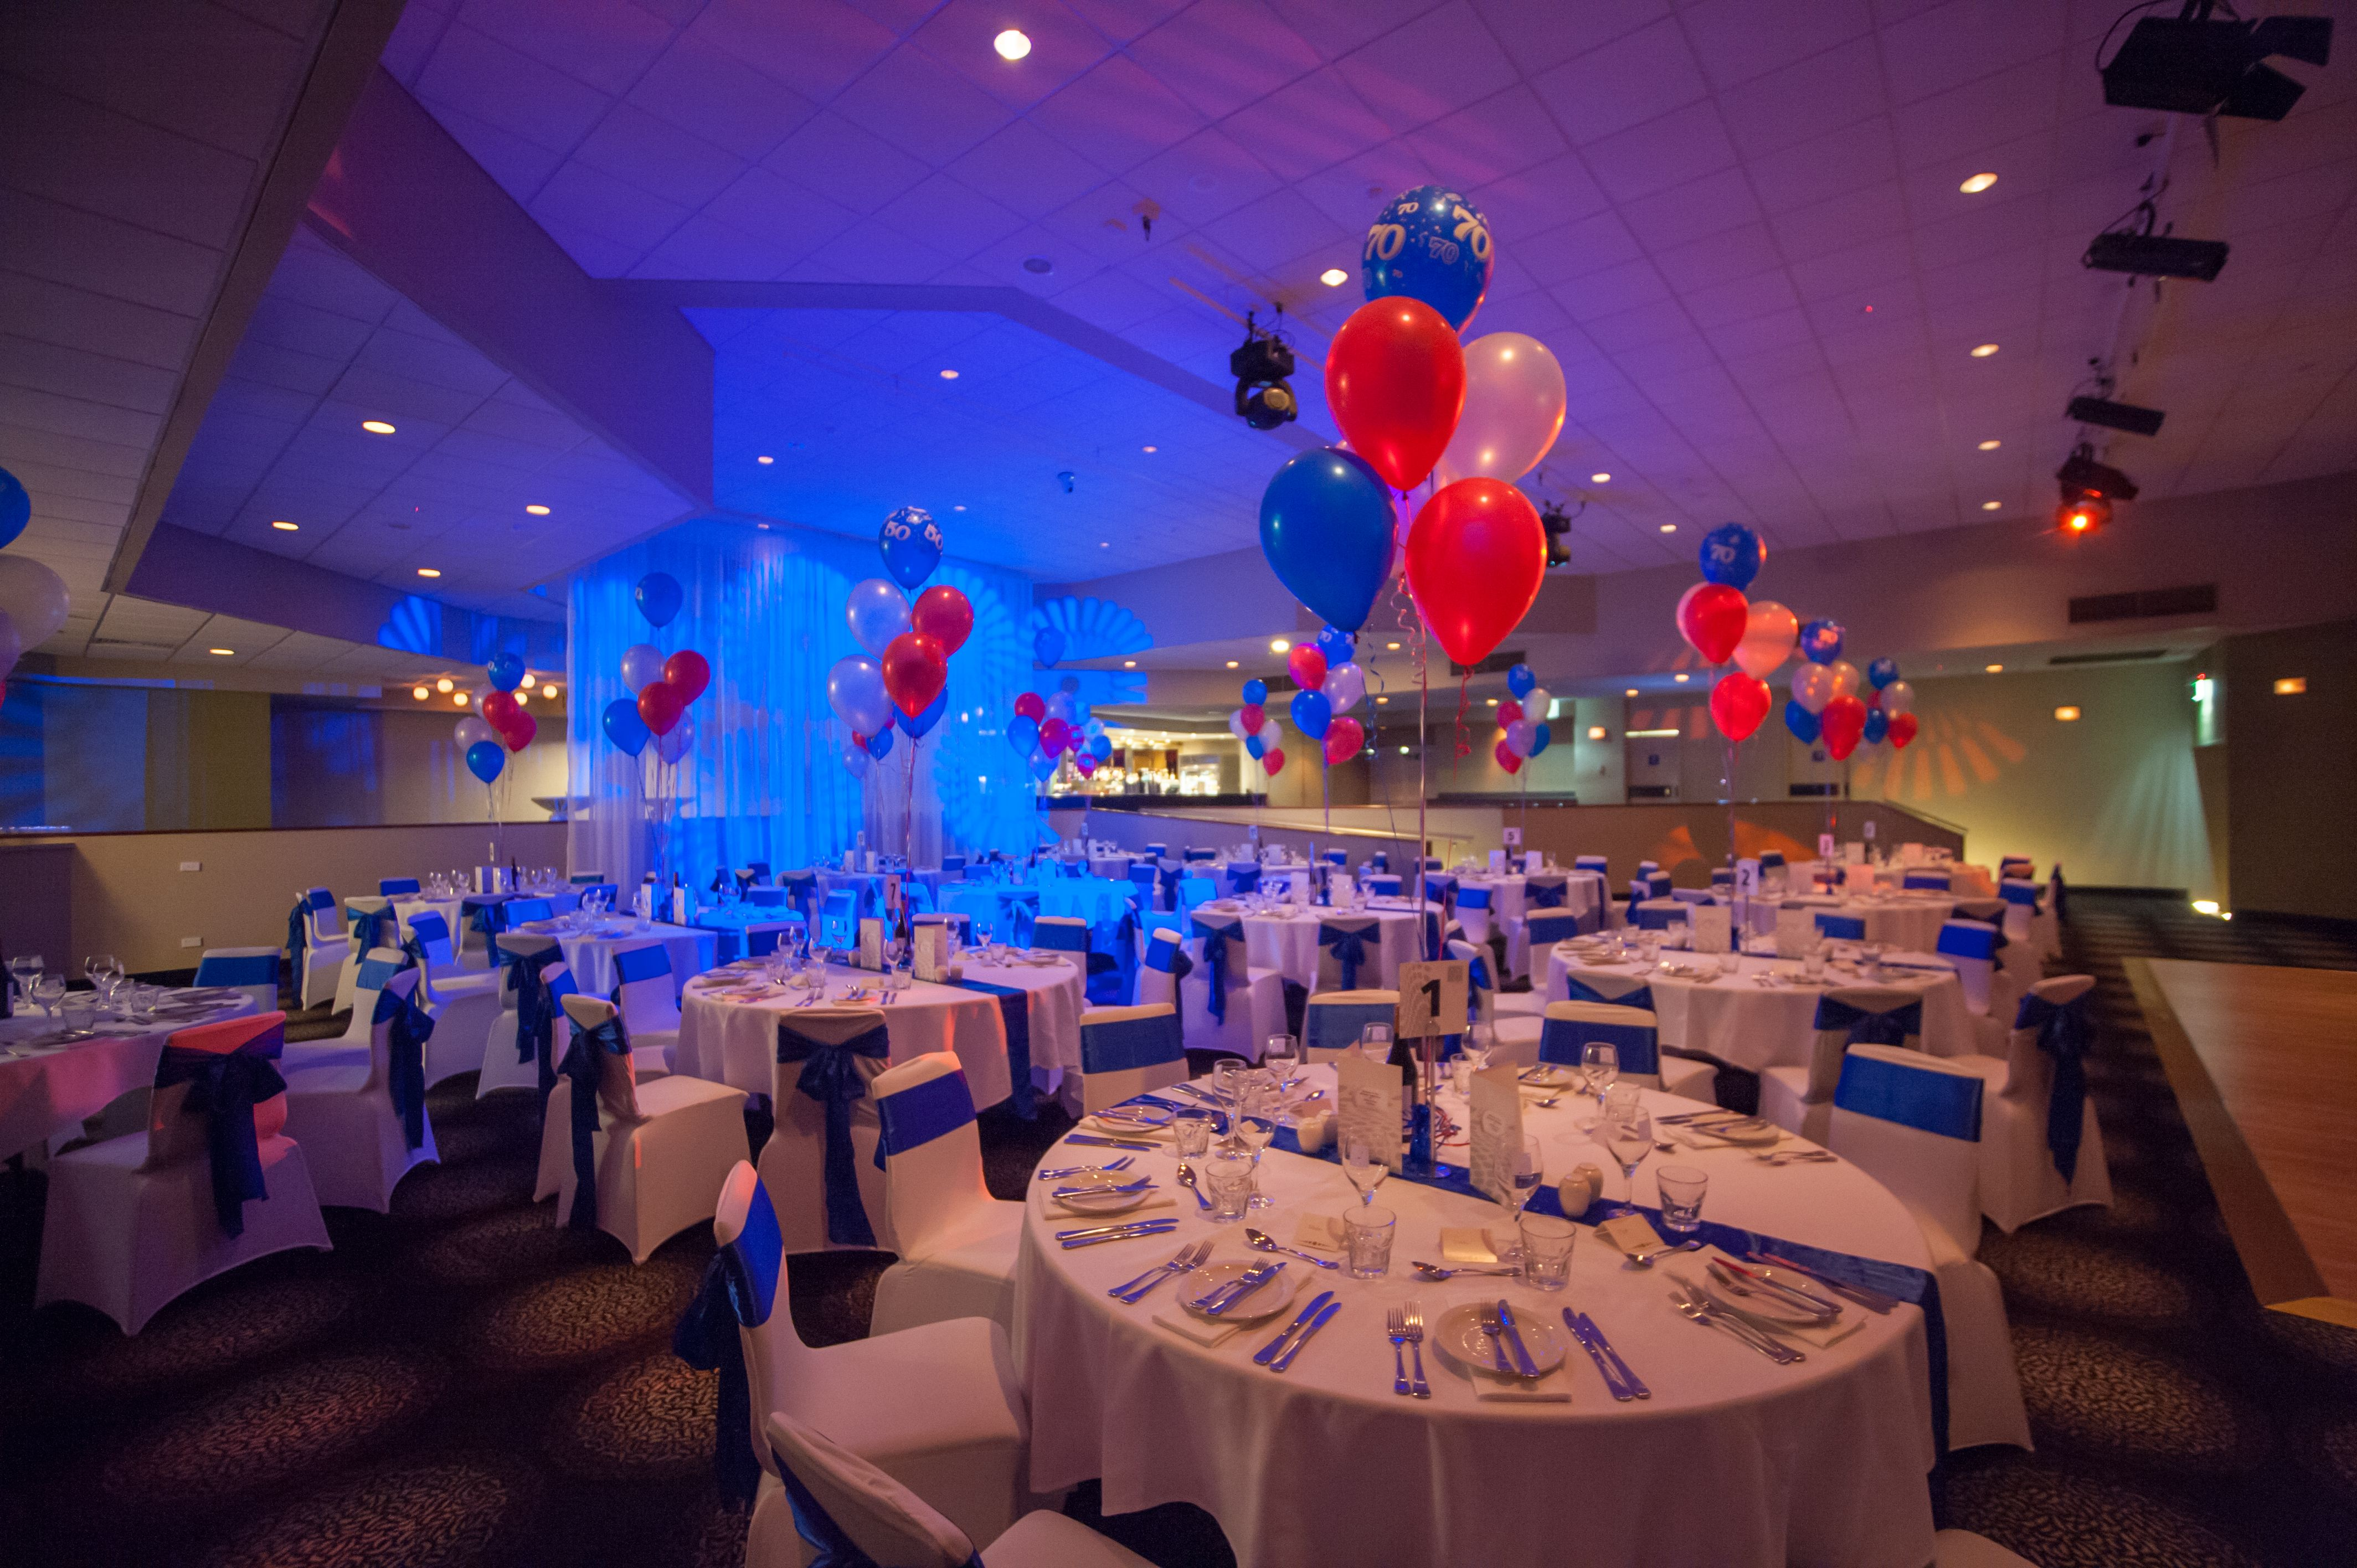 Birthday Celebrations The Venue @ Moama Bowling Club http://www.moamabowlingclub.com.au/